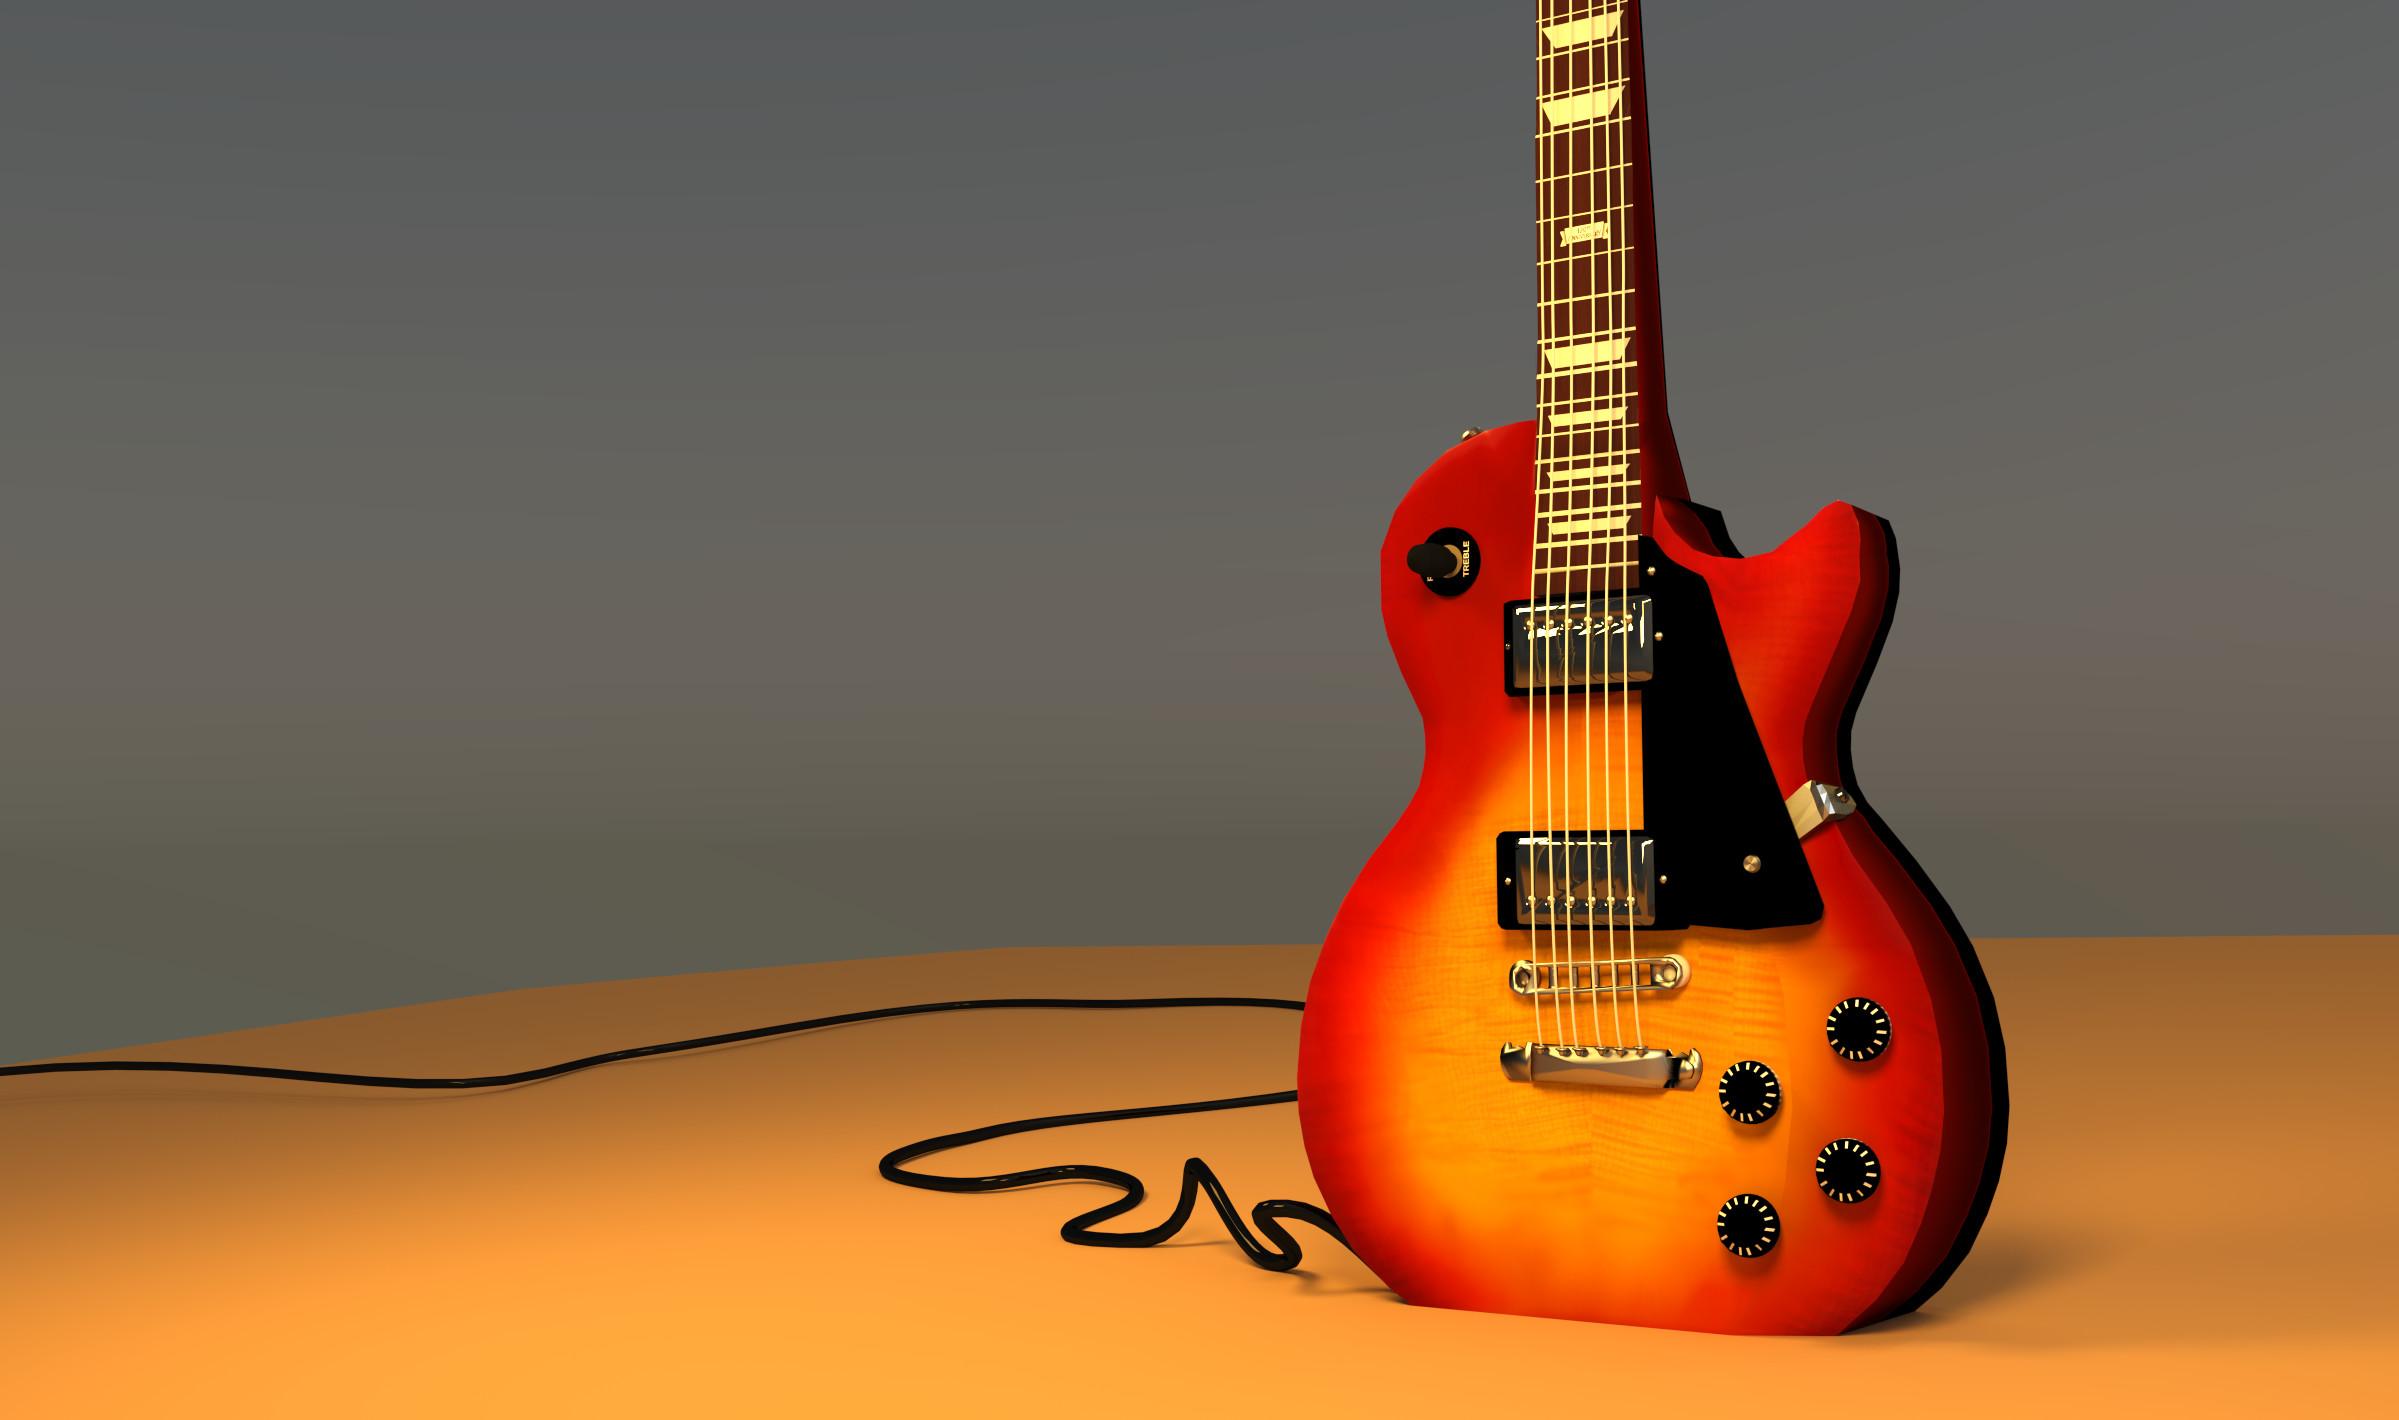 … Gibson Les Paul Studio Pro [2014] by ValiantPenguin